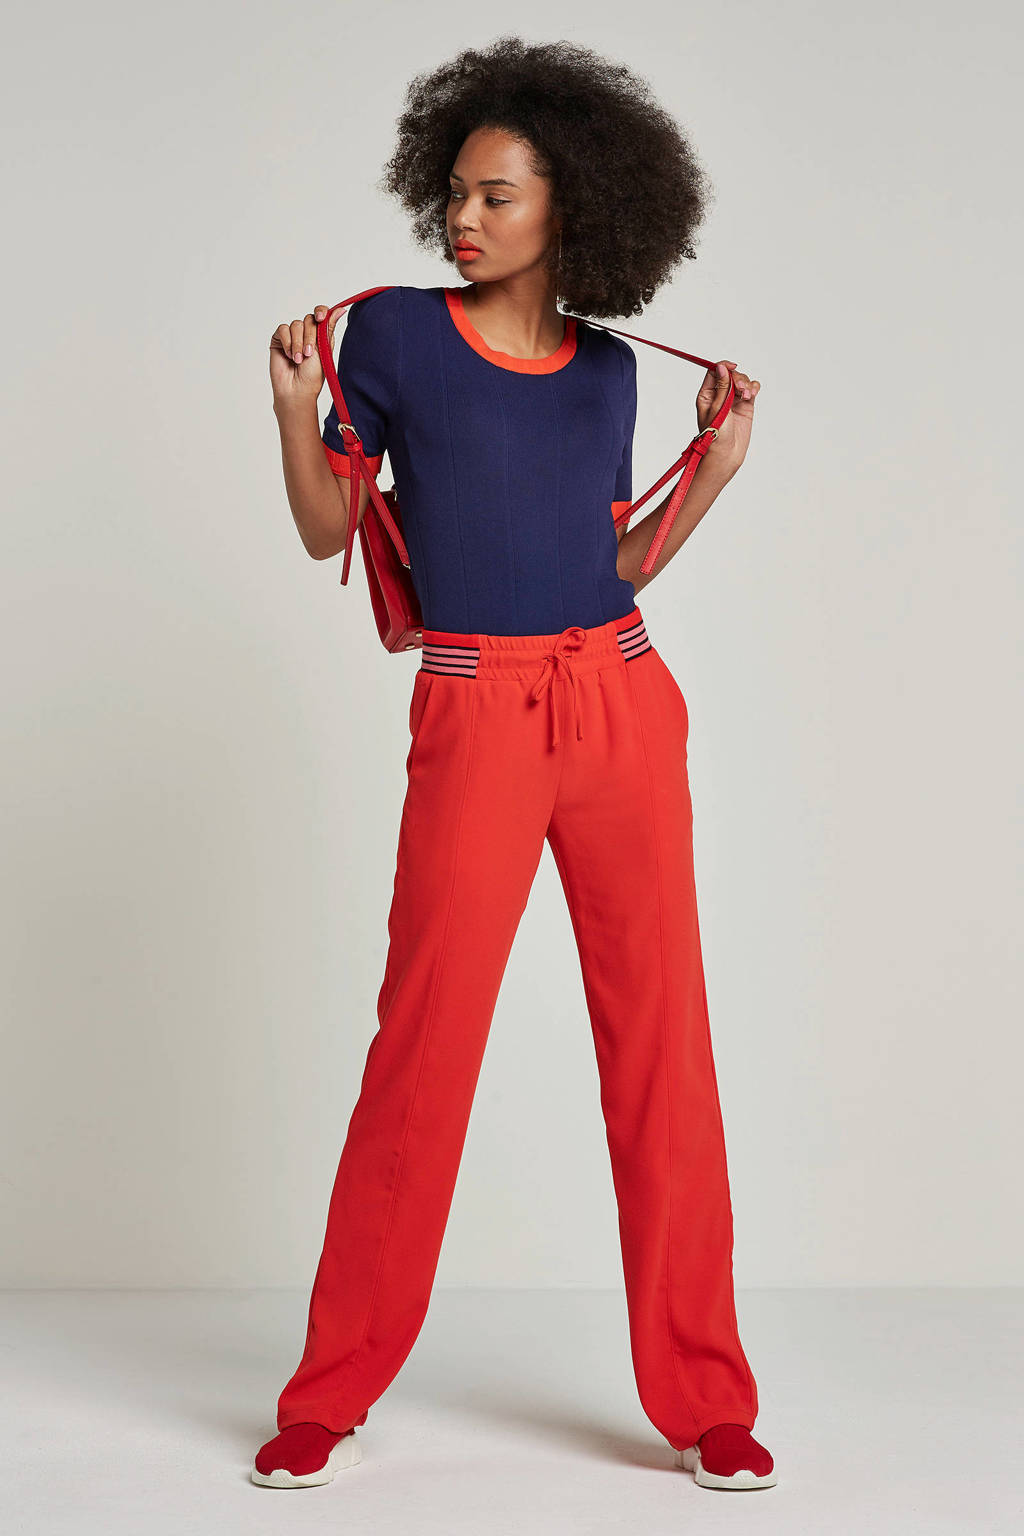 whkmp's own fijnbrei trui met brede rib, Donkerblauw/rood